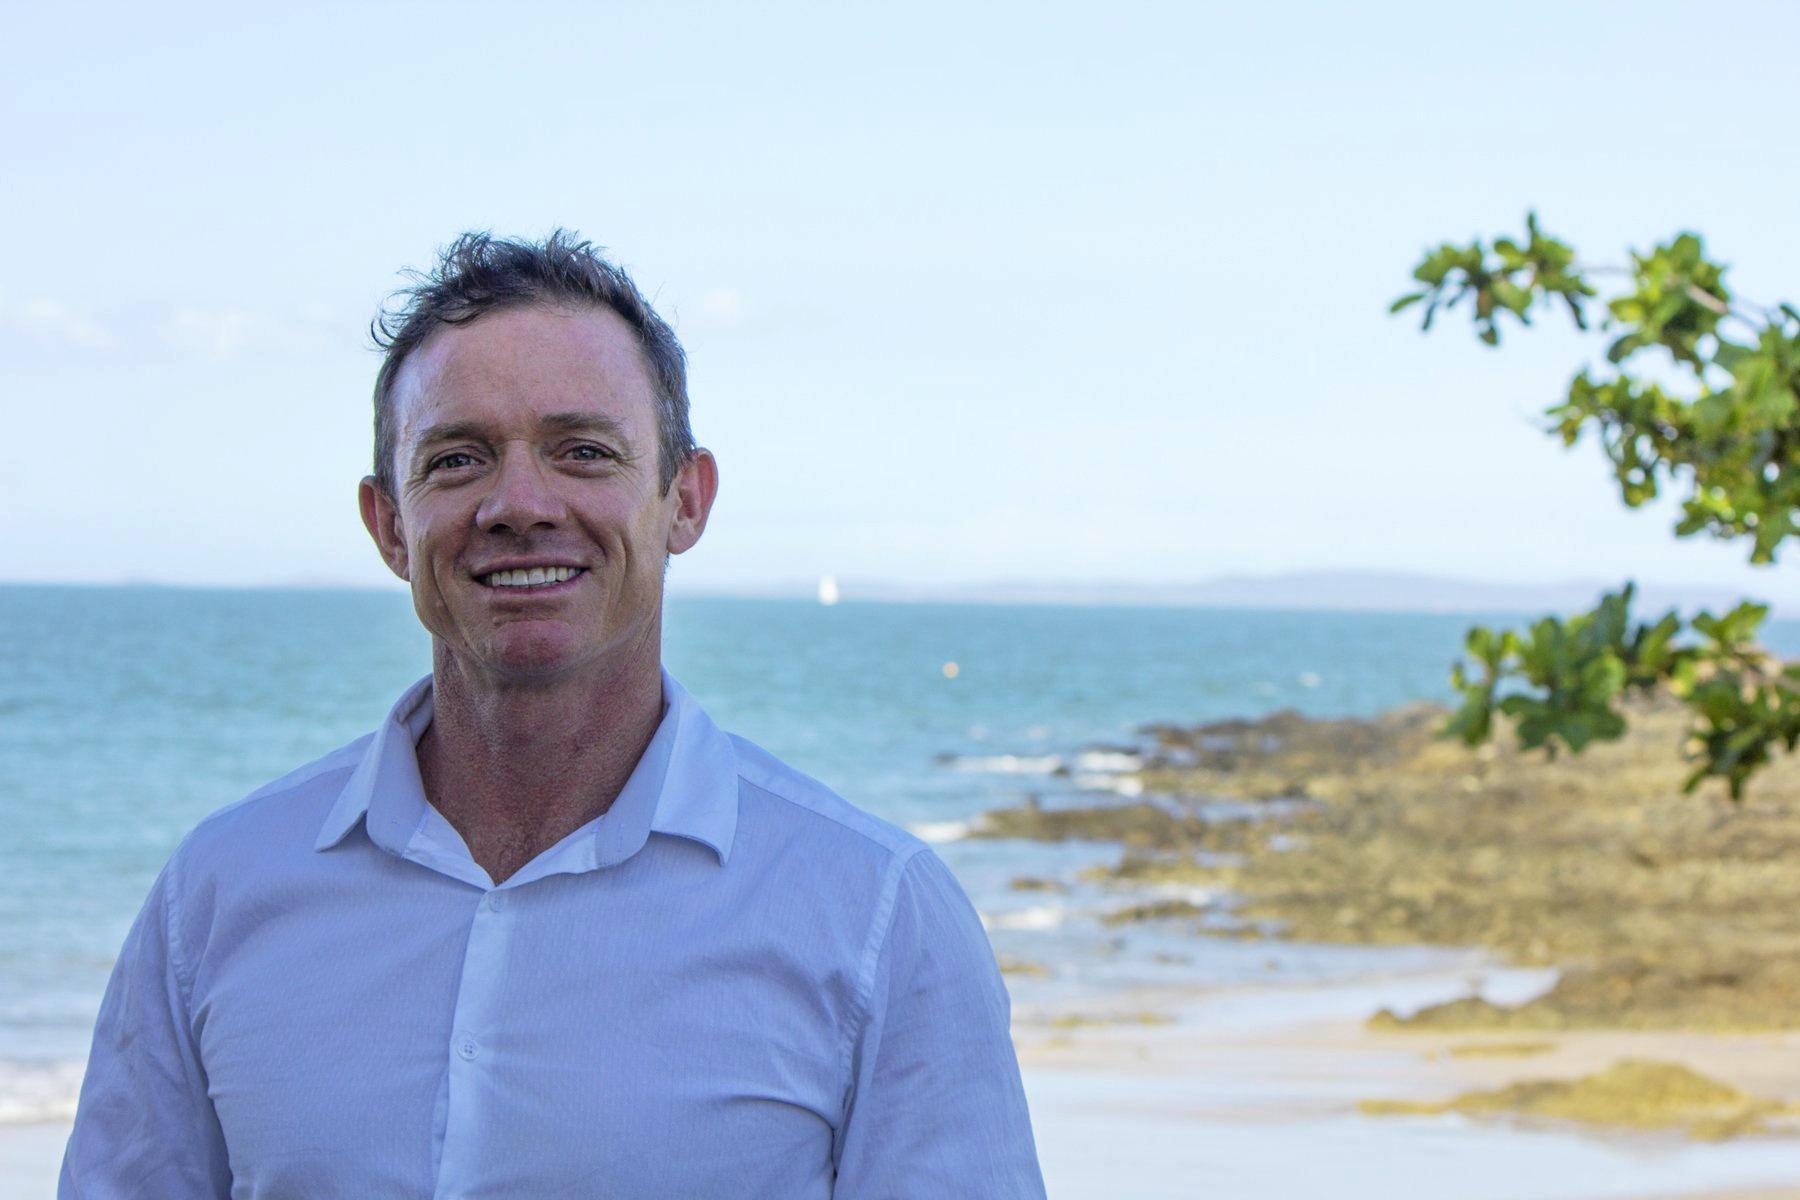 TOUGH TIMES: Livingstone Shire Councillor Adam Belot wants council to favour local businesses when assessing tenders.